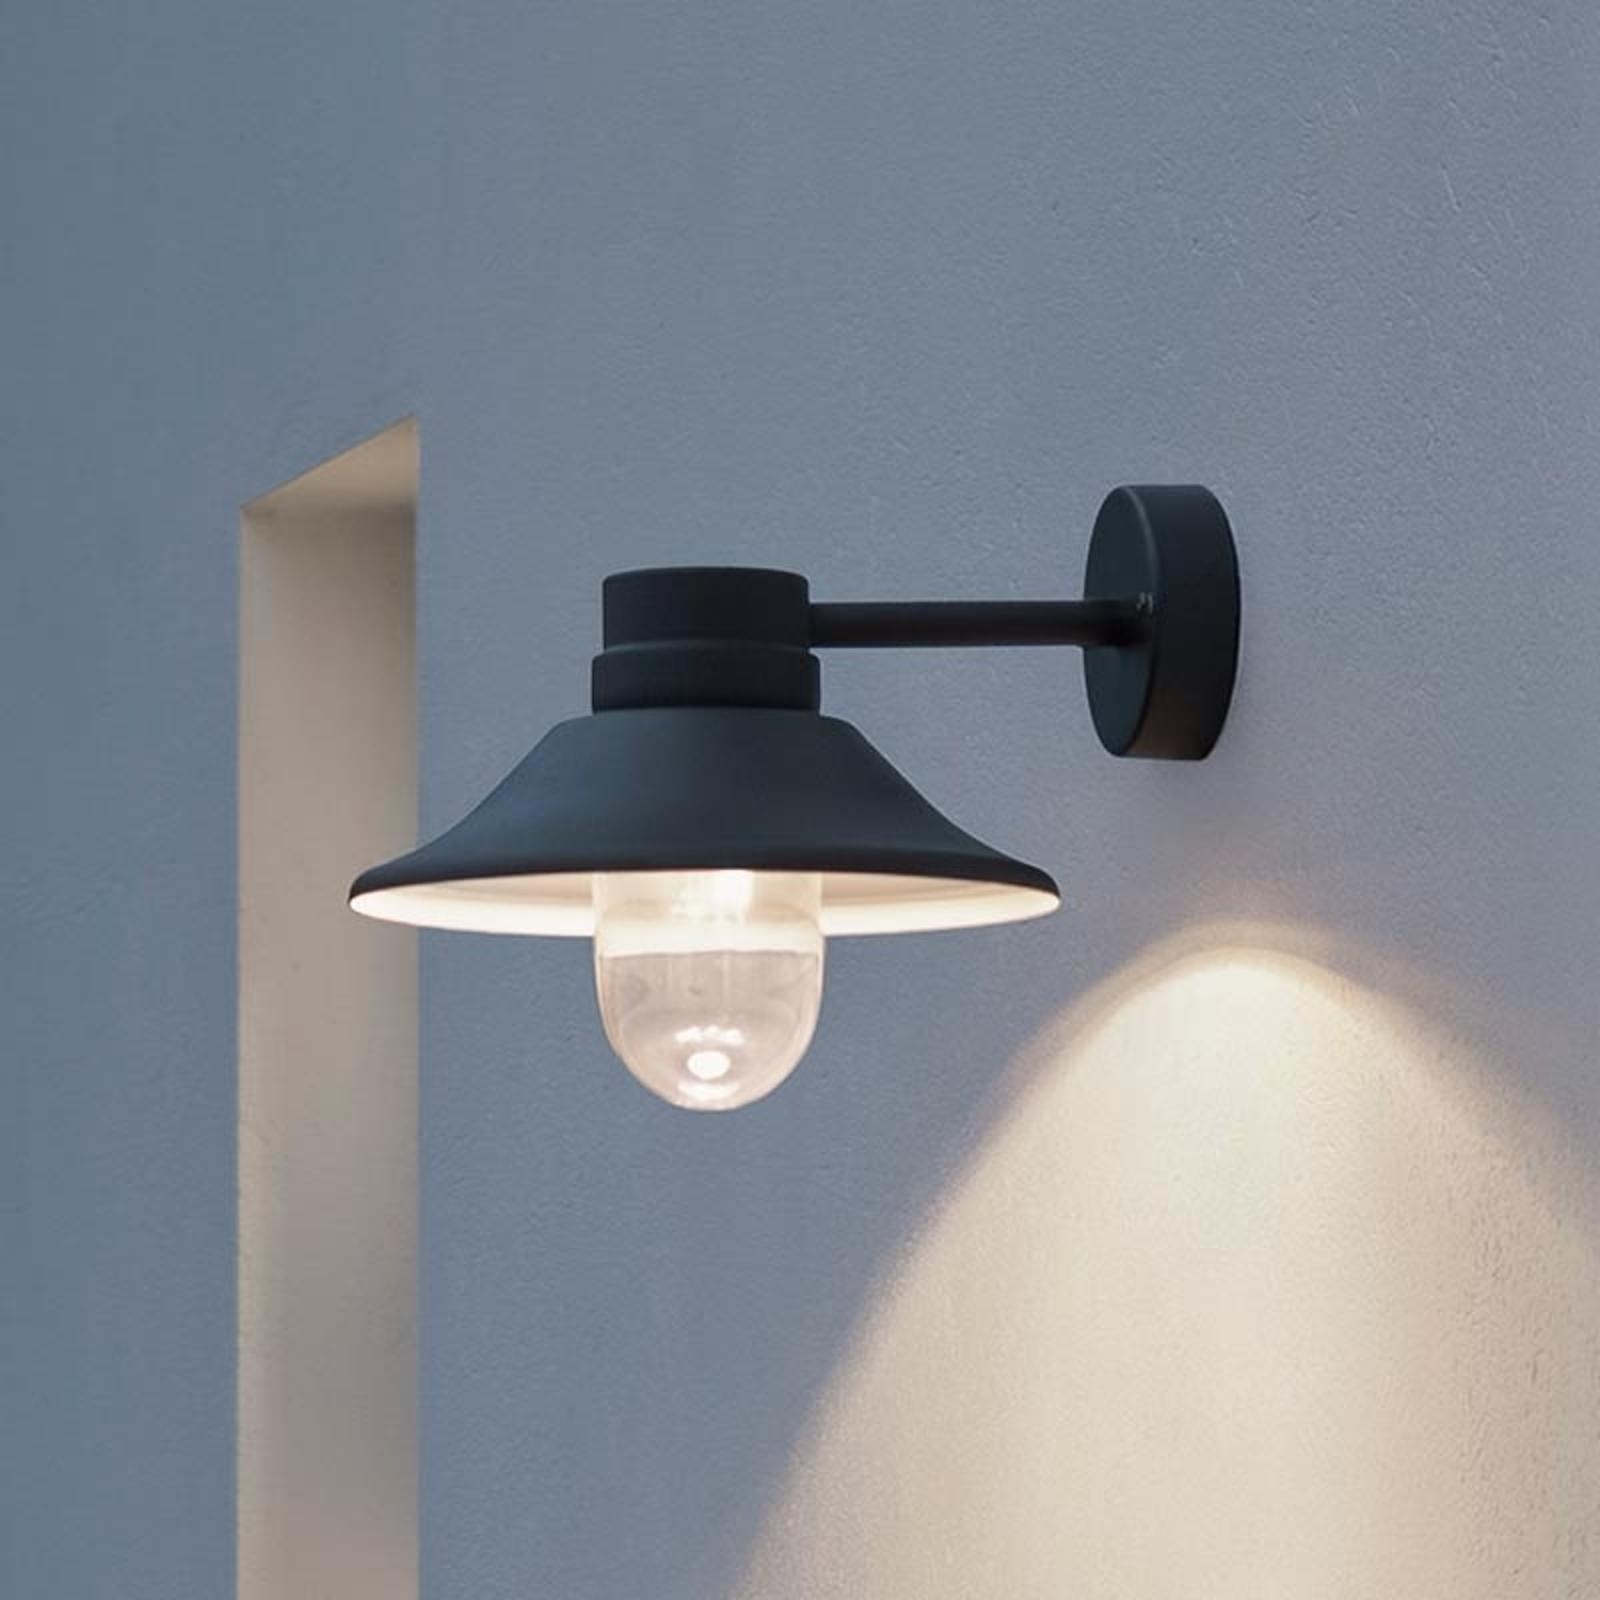 Zewnętrzna lampa ścienna LED VEGA, czarna